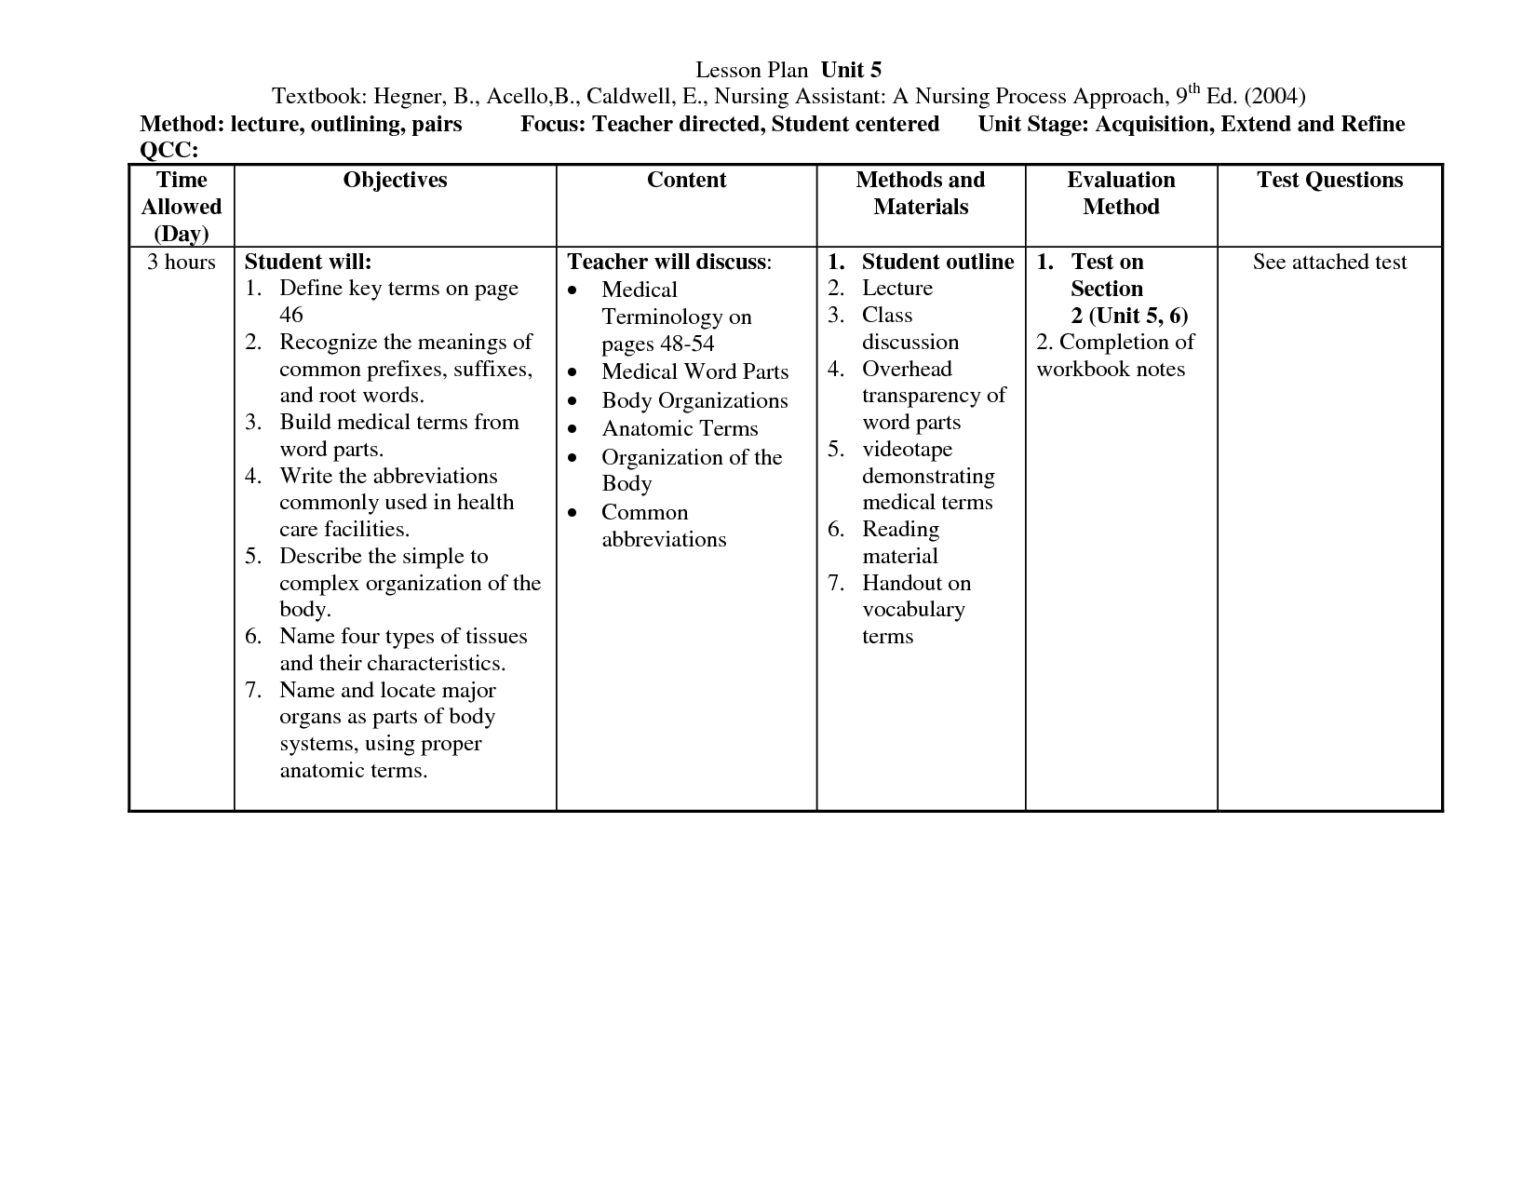 Worksheets For Teaching Nurses Printable Worksheets And For Nursing Assistant Report Sheet Templates Teaching Plan Templates Teaching Plan Nursing Assistant